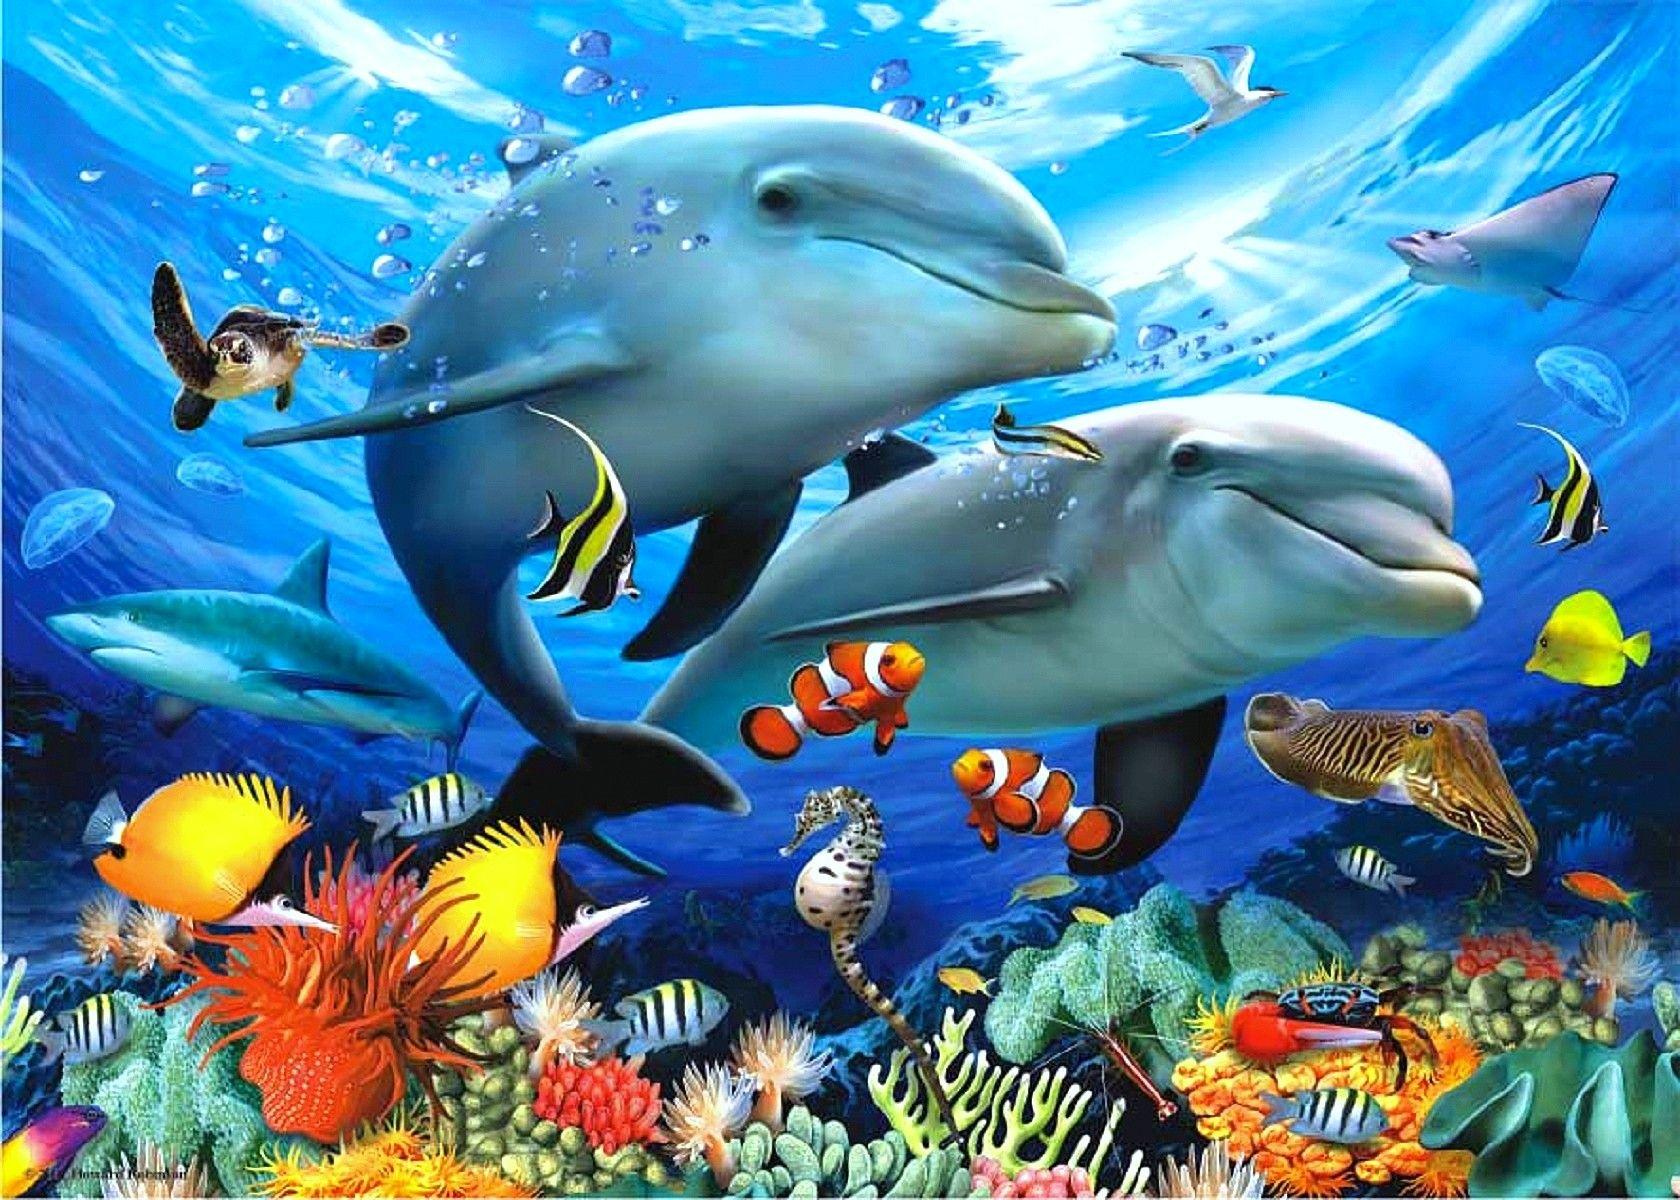 oceansdreamspreunderwateranimalsdownloaded